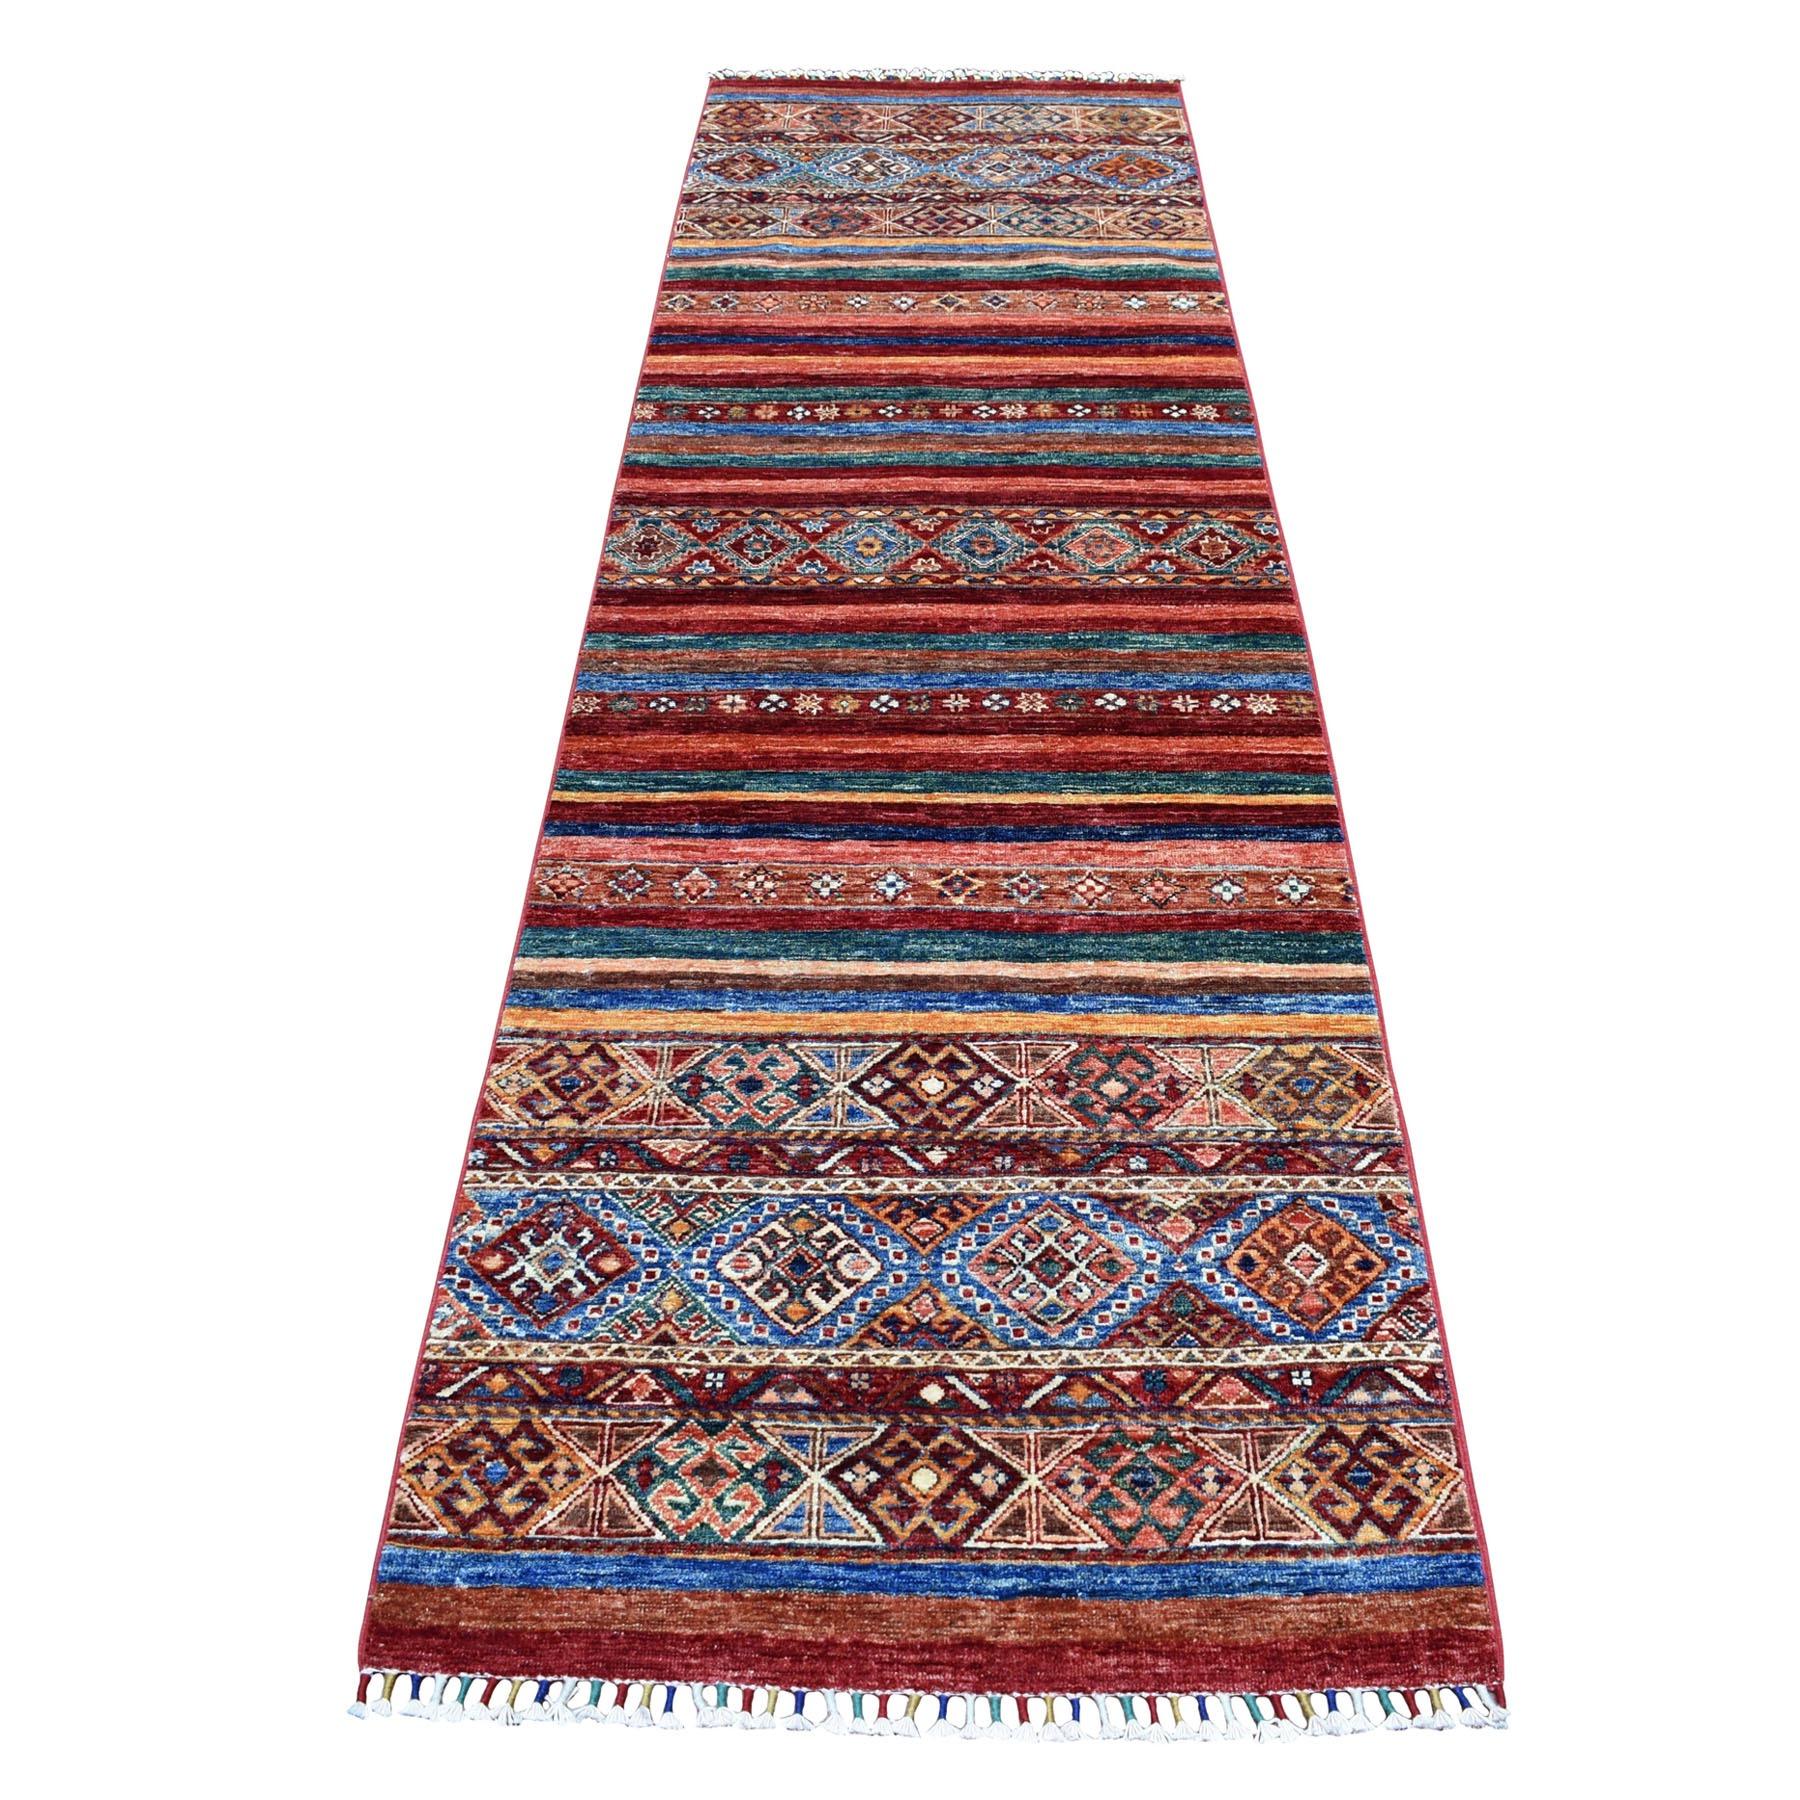 "3'X9'4"" Khorjin Design Colorful Runner Super Kazak Pure Wool Hand Knotted Oriental Rug moaebd70"